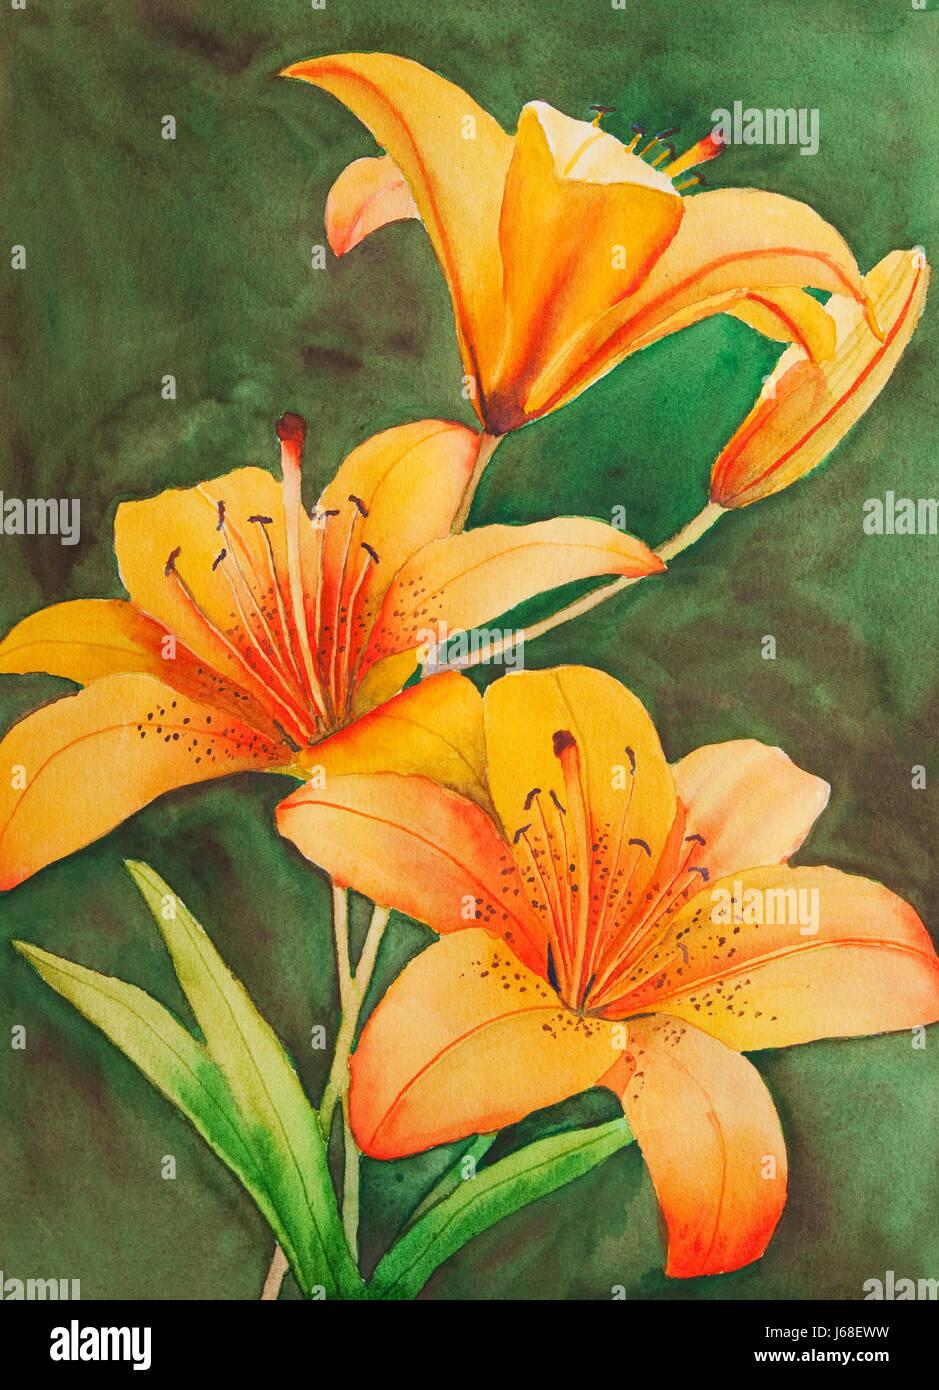 Art Flower Plant Painting Lily Orange Watercolor Dyer Staint Pigment